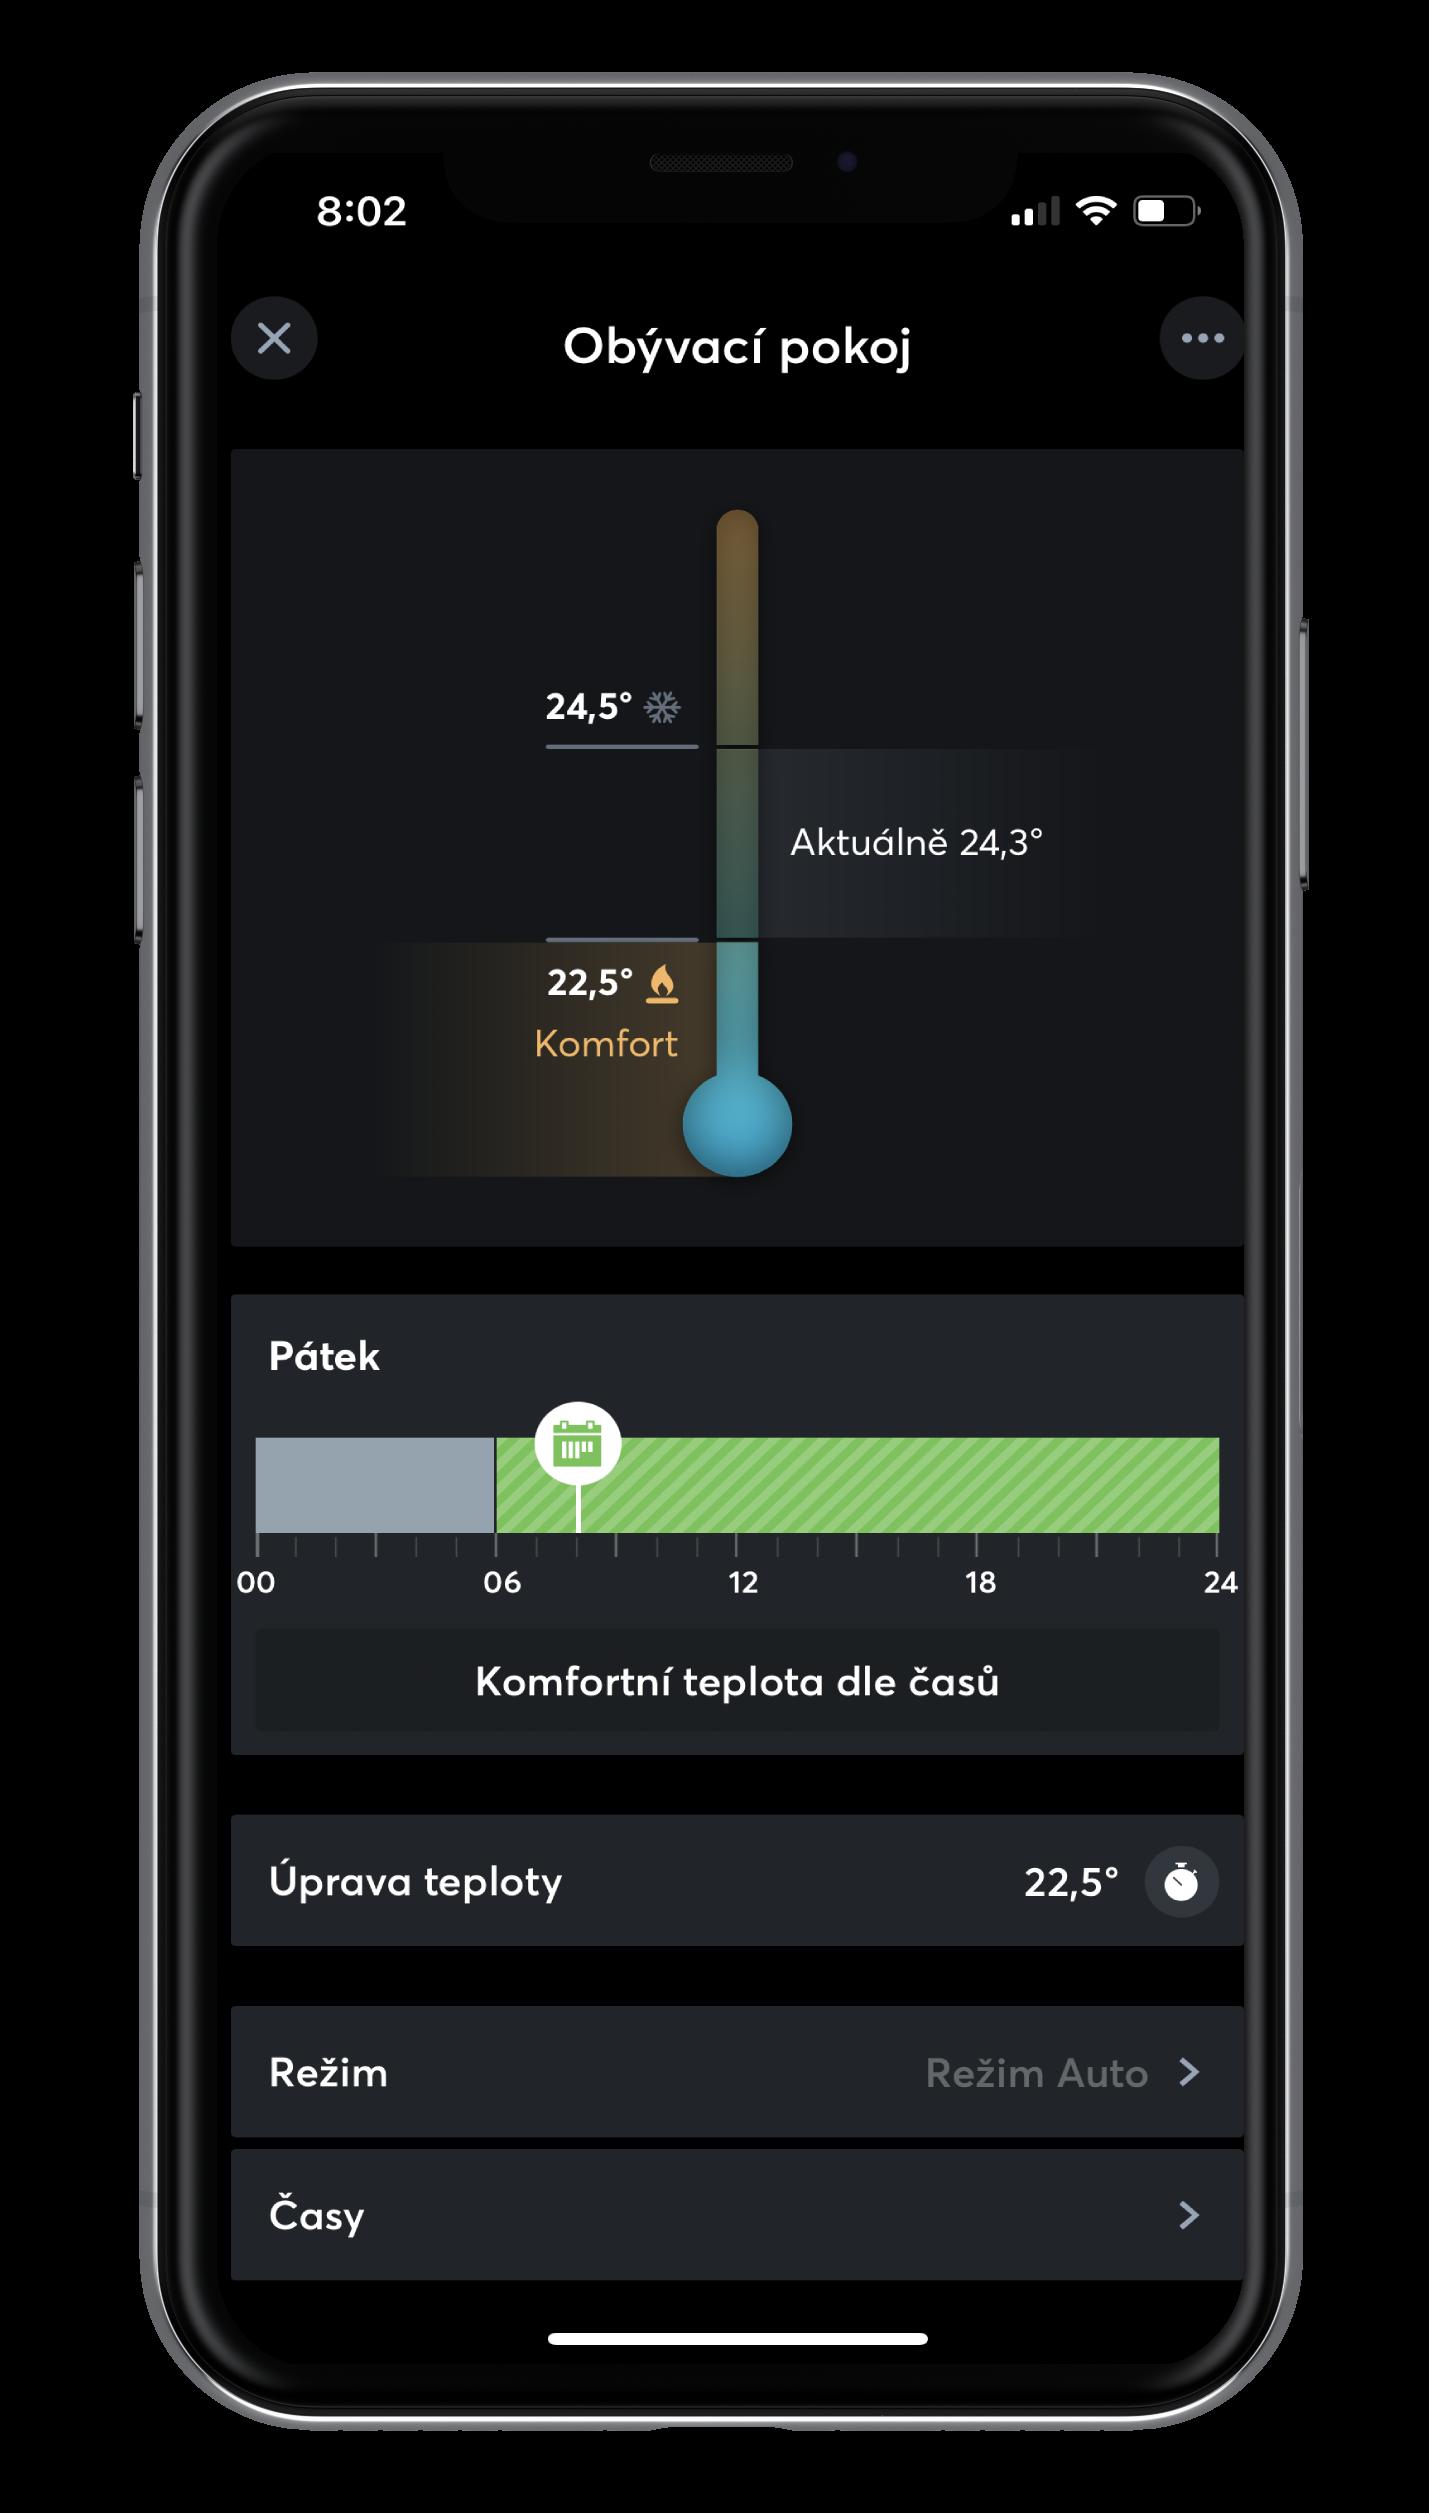 Nastavení teploty v mobilu